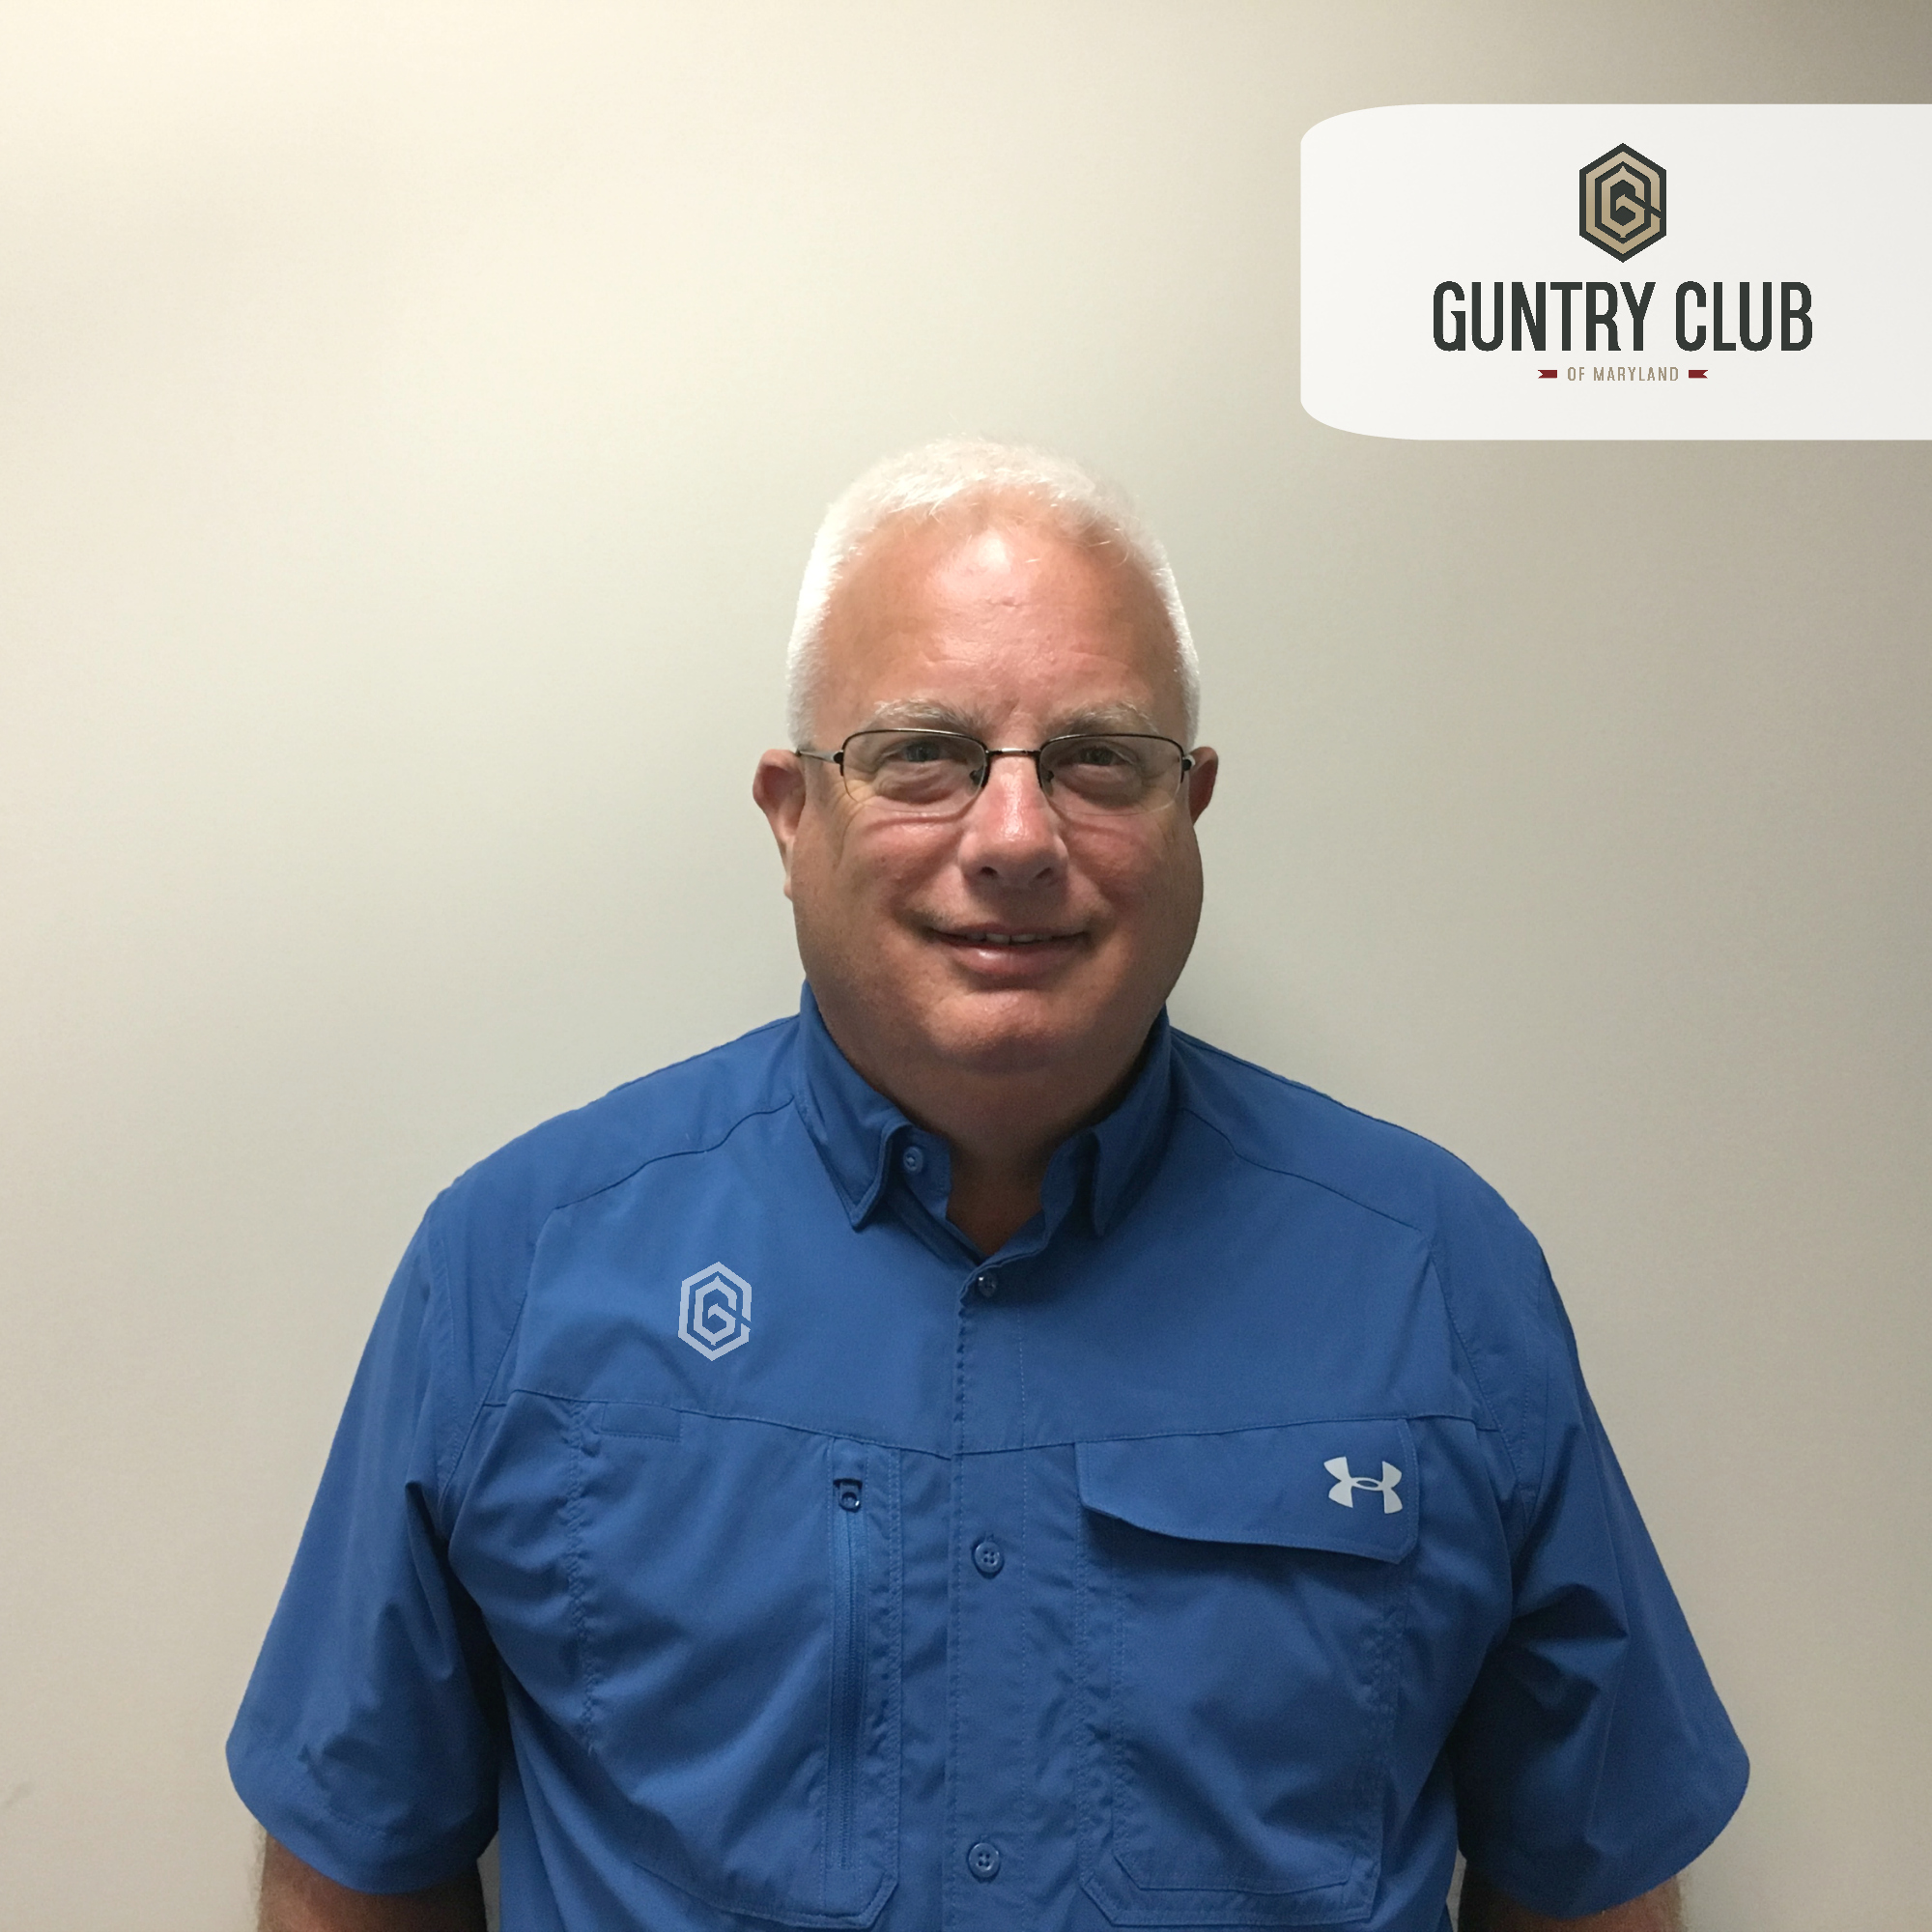 Rick Landsman GUNTRY Club.jpg